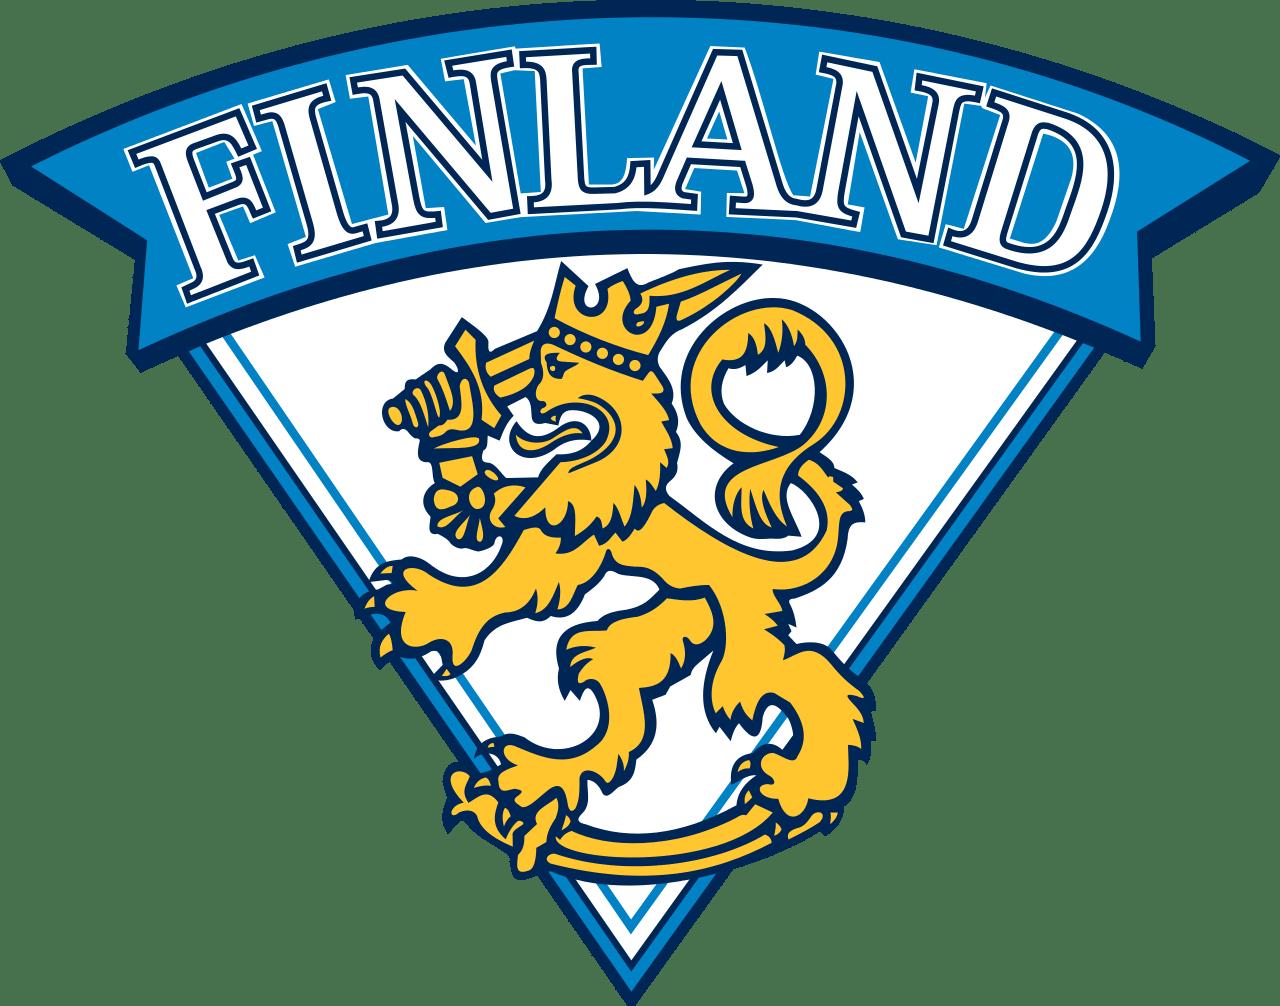 Finland_national_men's_ice_hockey_team_logo.svg